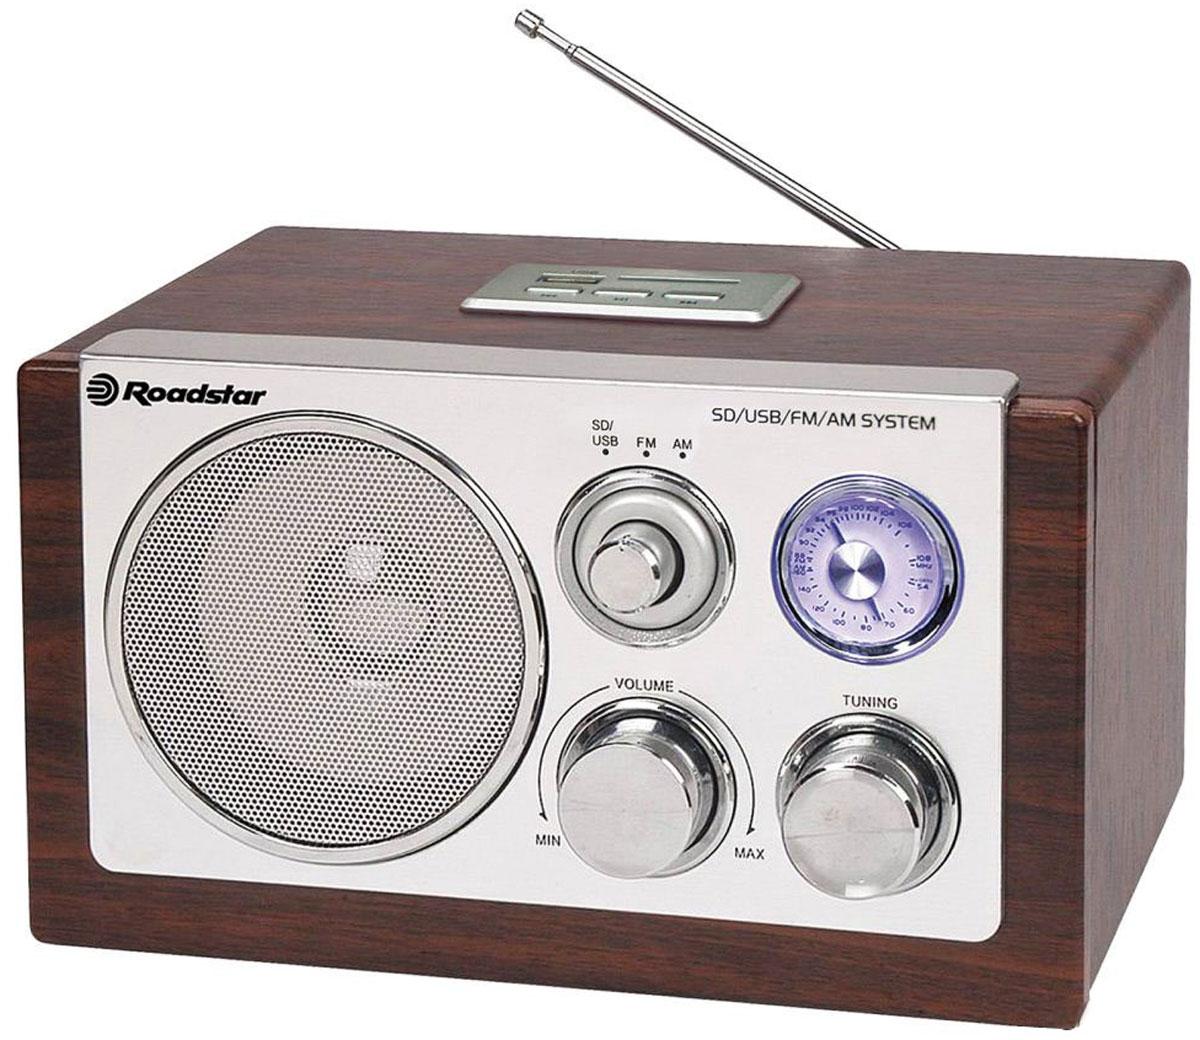 RoadStar HRA-1325US/WD, Wood, ретро-радиоприемник